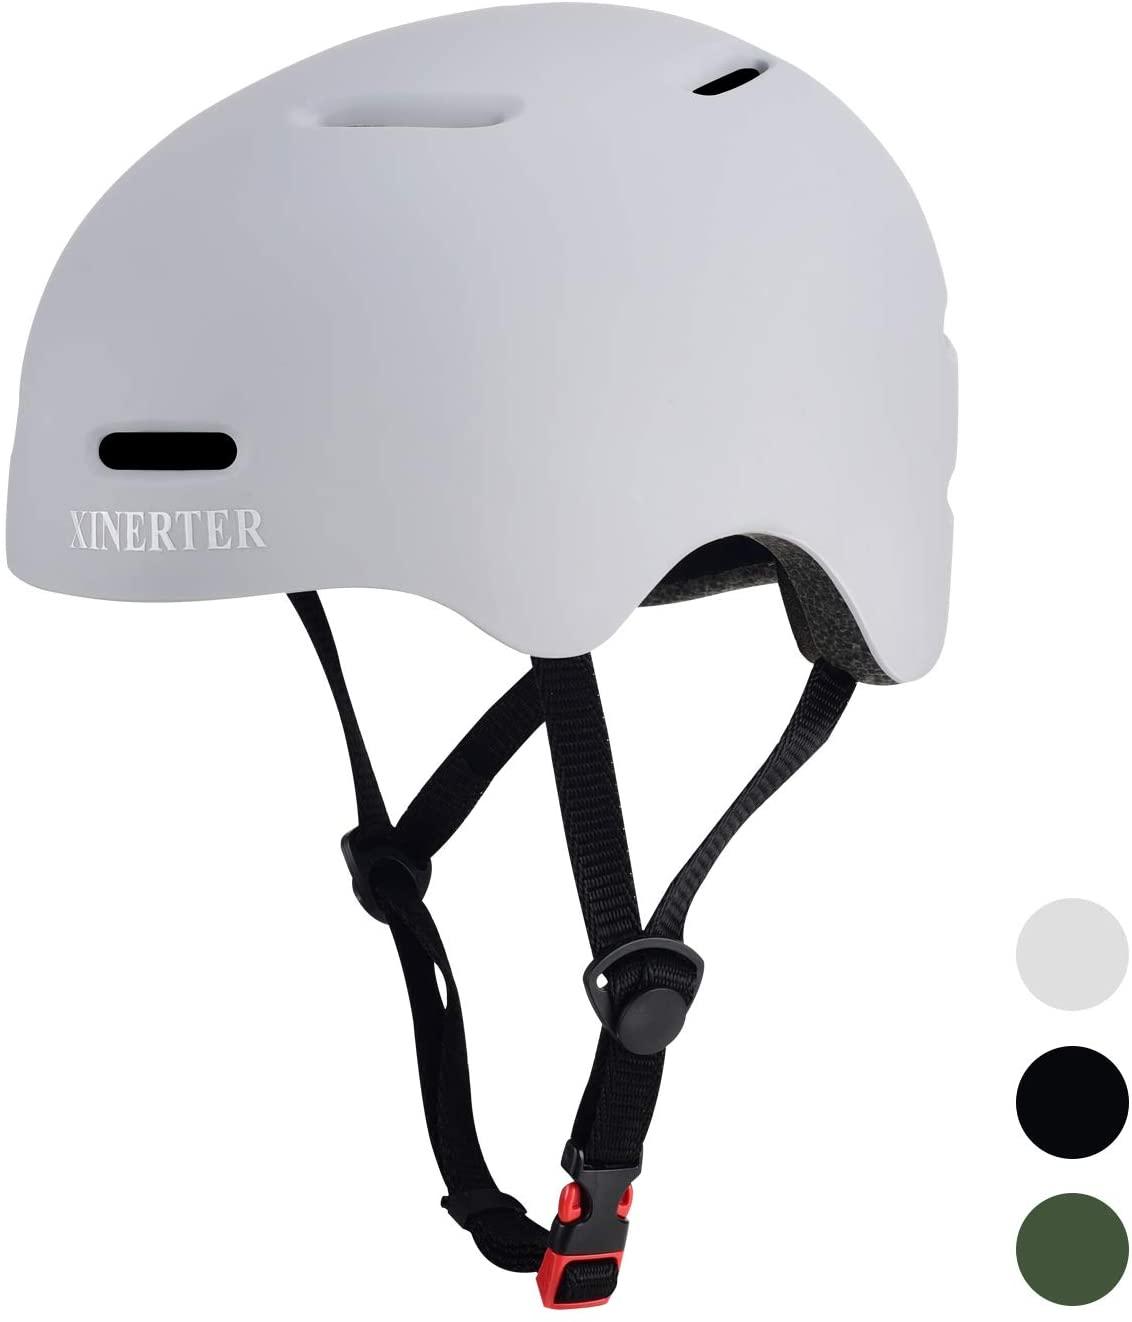 Skateboard Helmet Kids Bike Helmet BMX Helmet, Multi- Sport Helmet with 1 Sets of Replaceable Pads, Bike Helmet for Kids, Youth, Men, Women Applicable Head Type 19.6-22.4 in